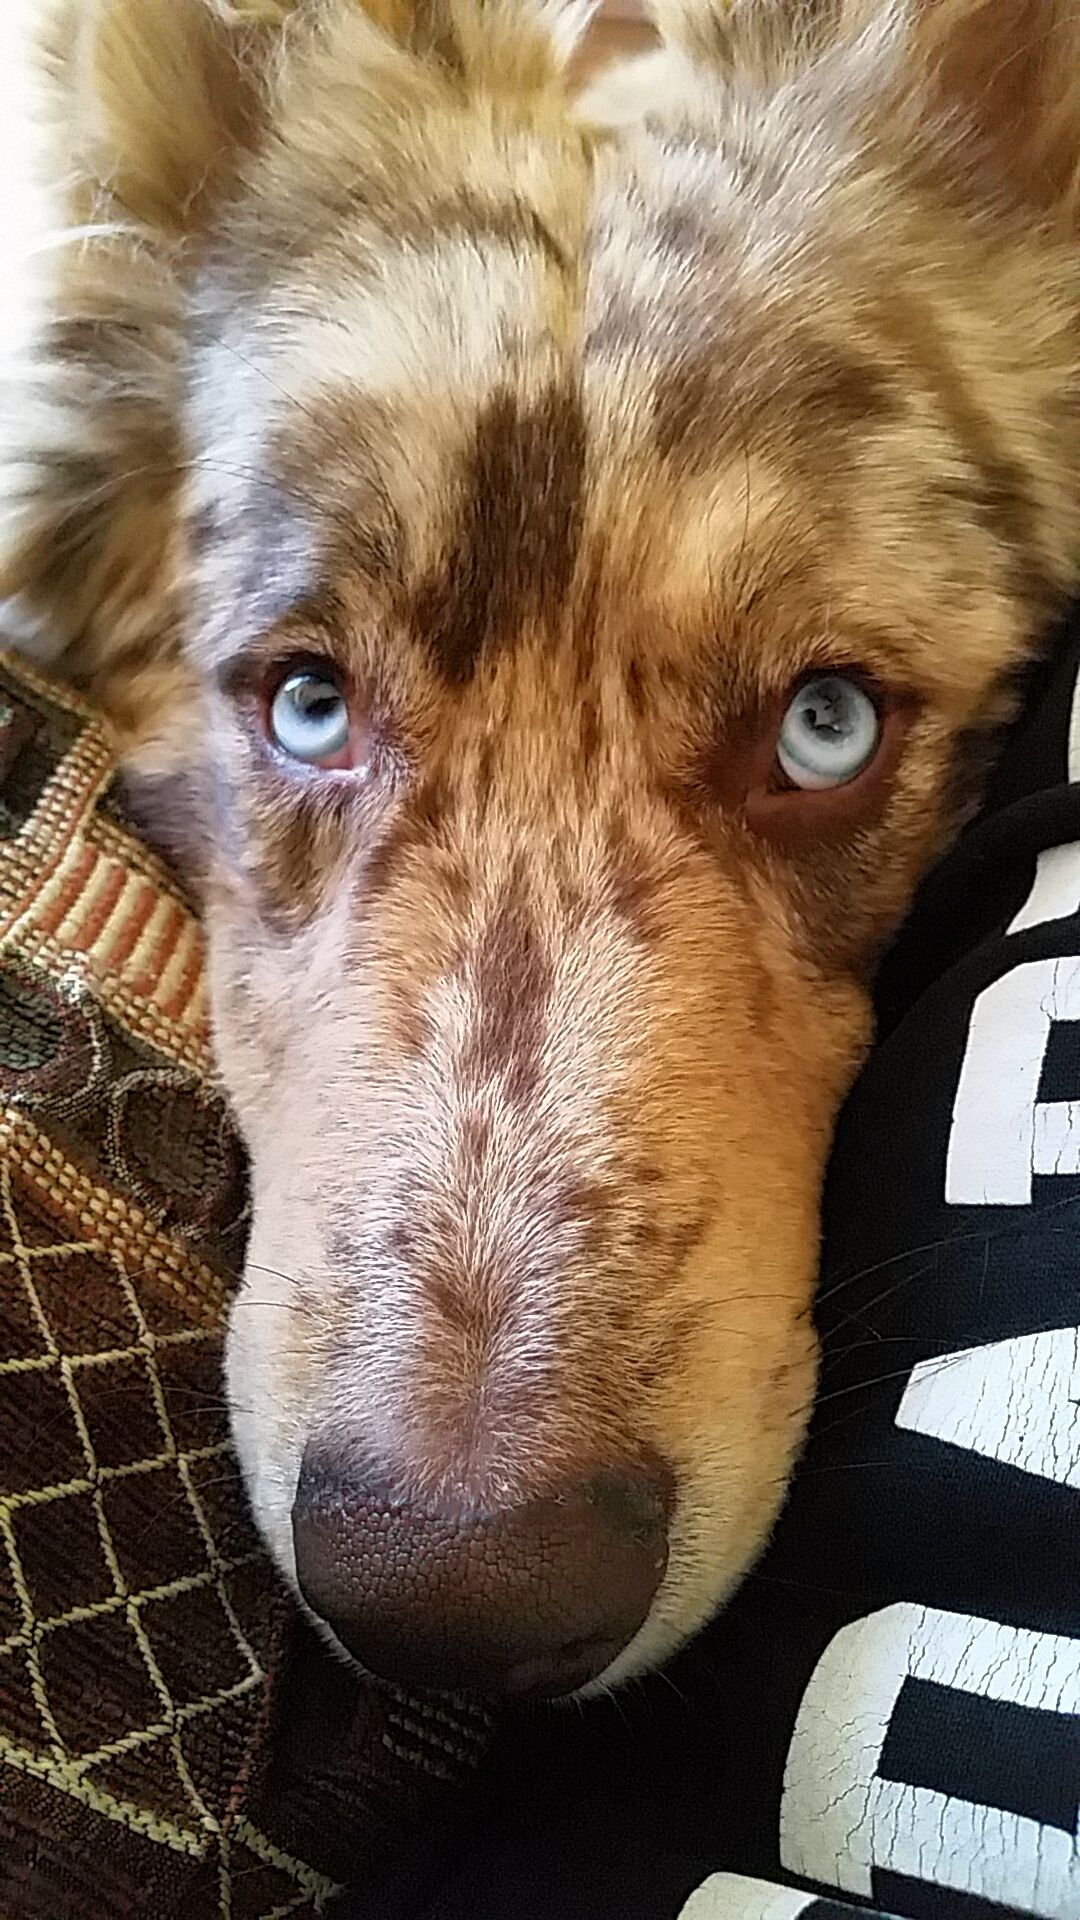 Introducing Todd my 7 month old Husky/Australian Shepherd mix!